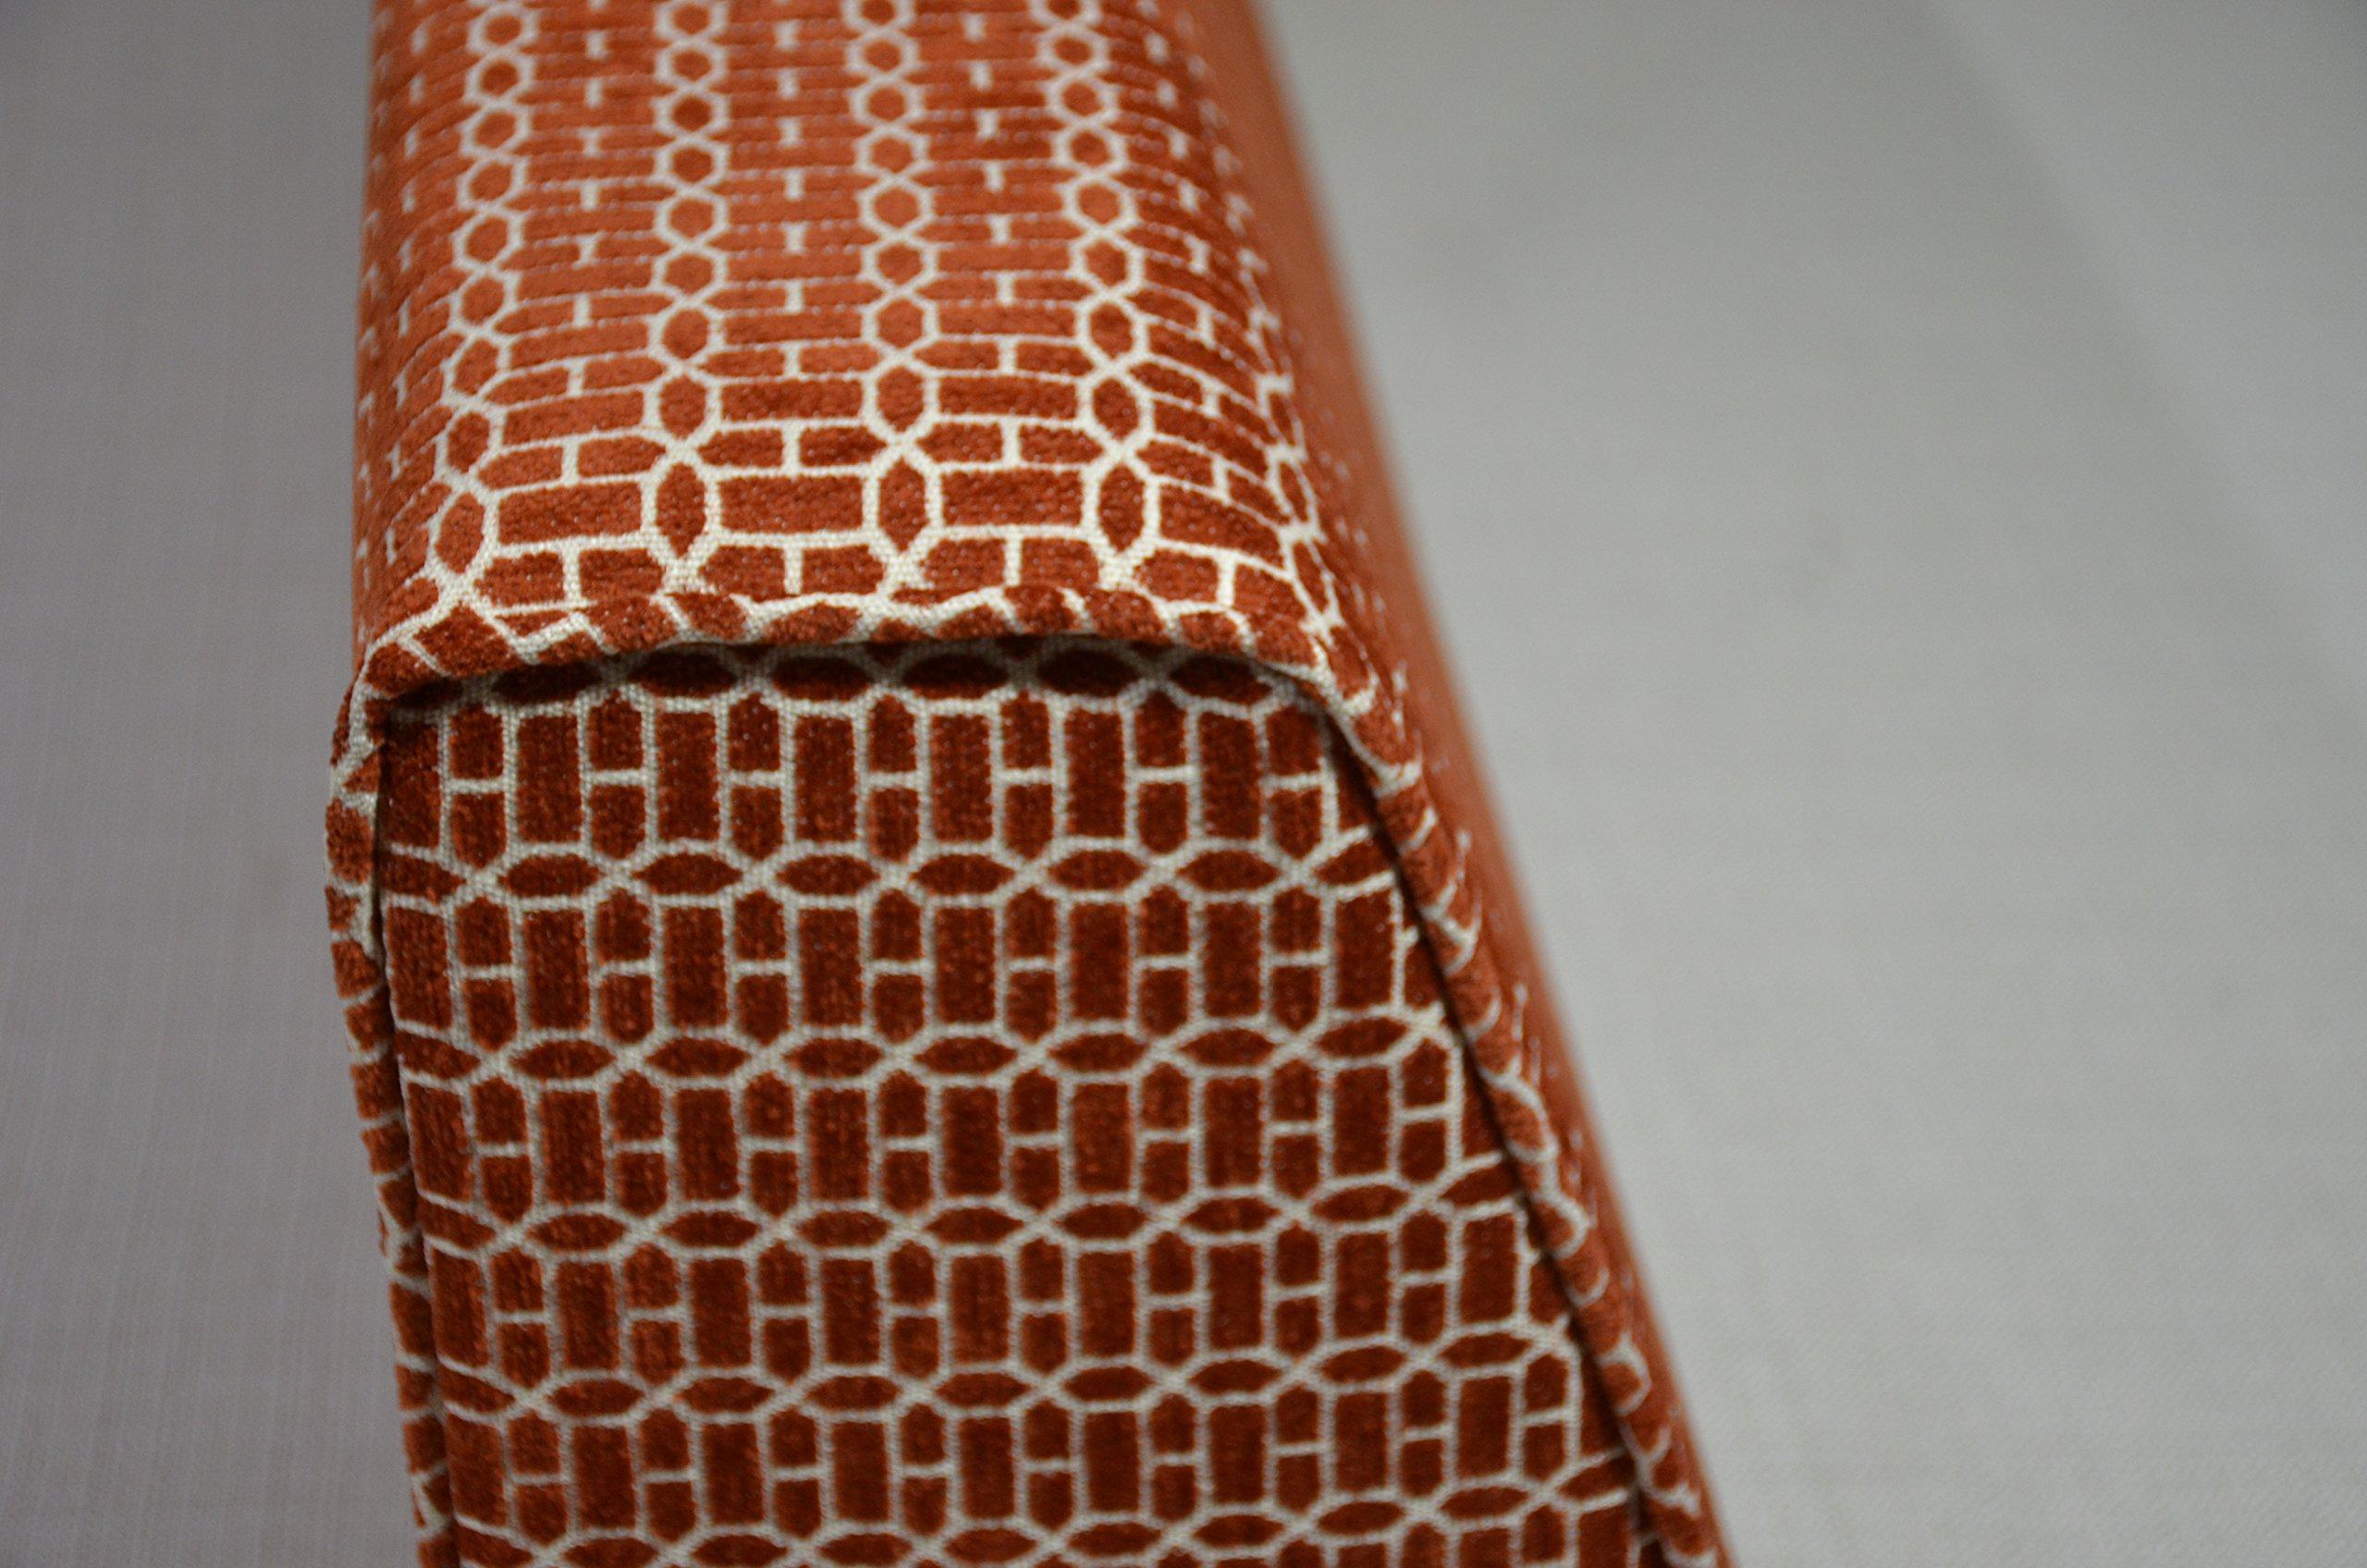 micama Wedge Bolster Cover (Charcoal Grey)